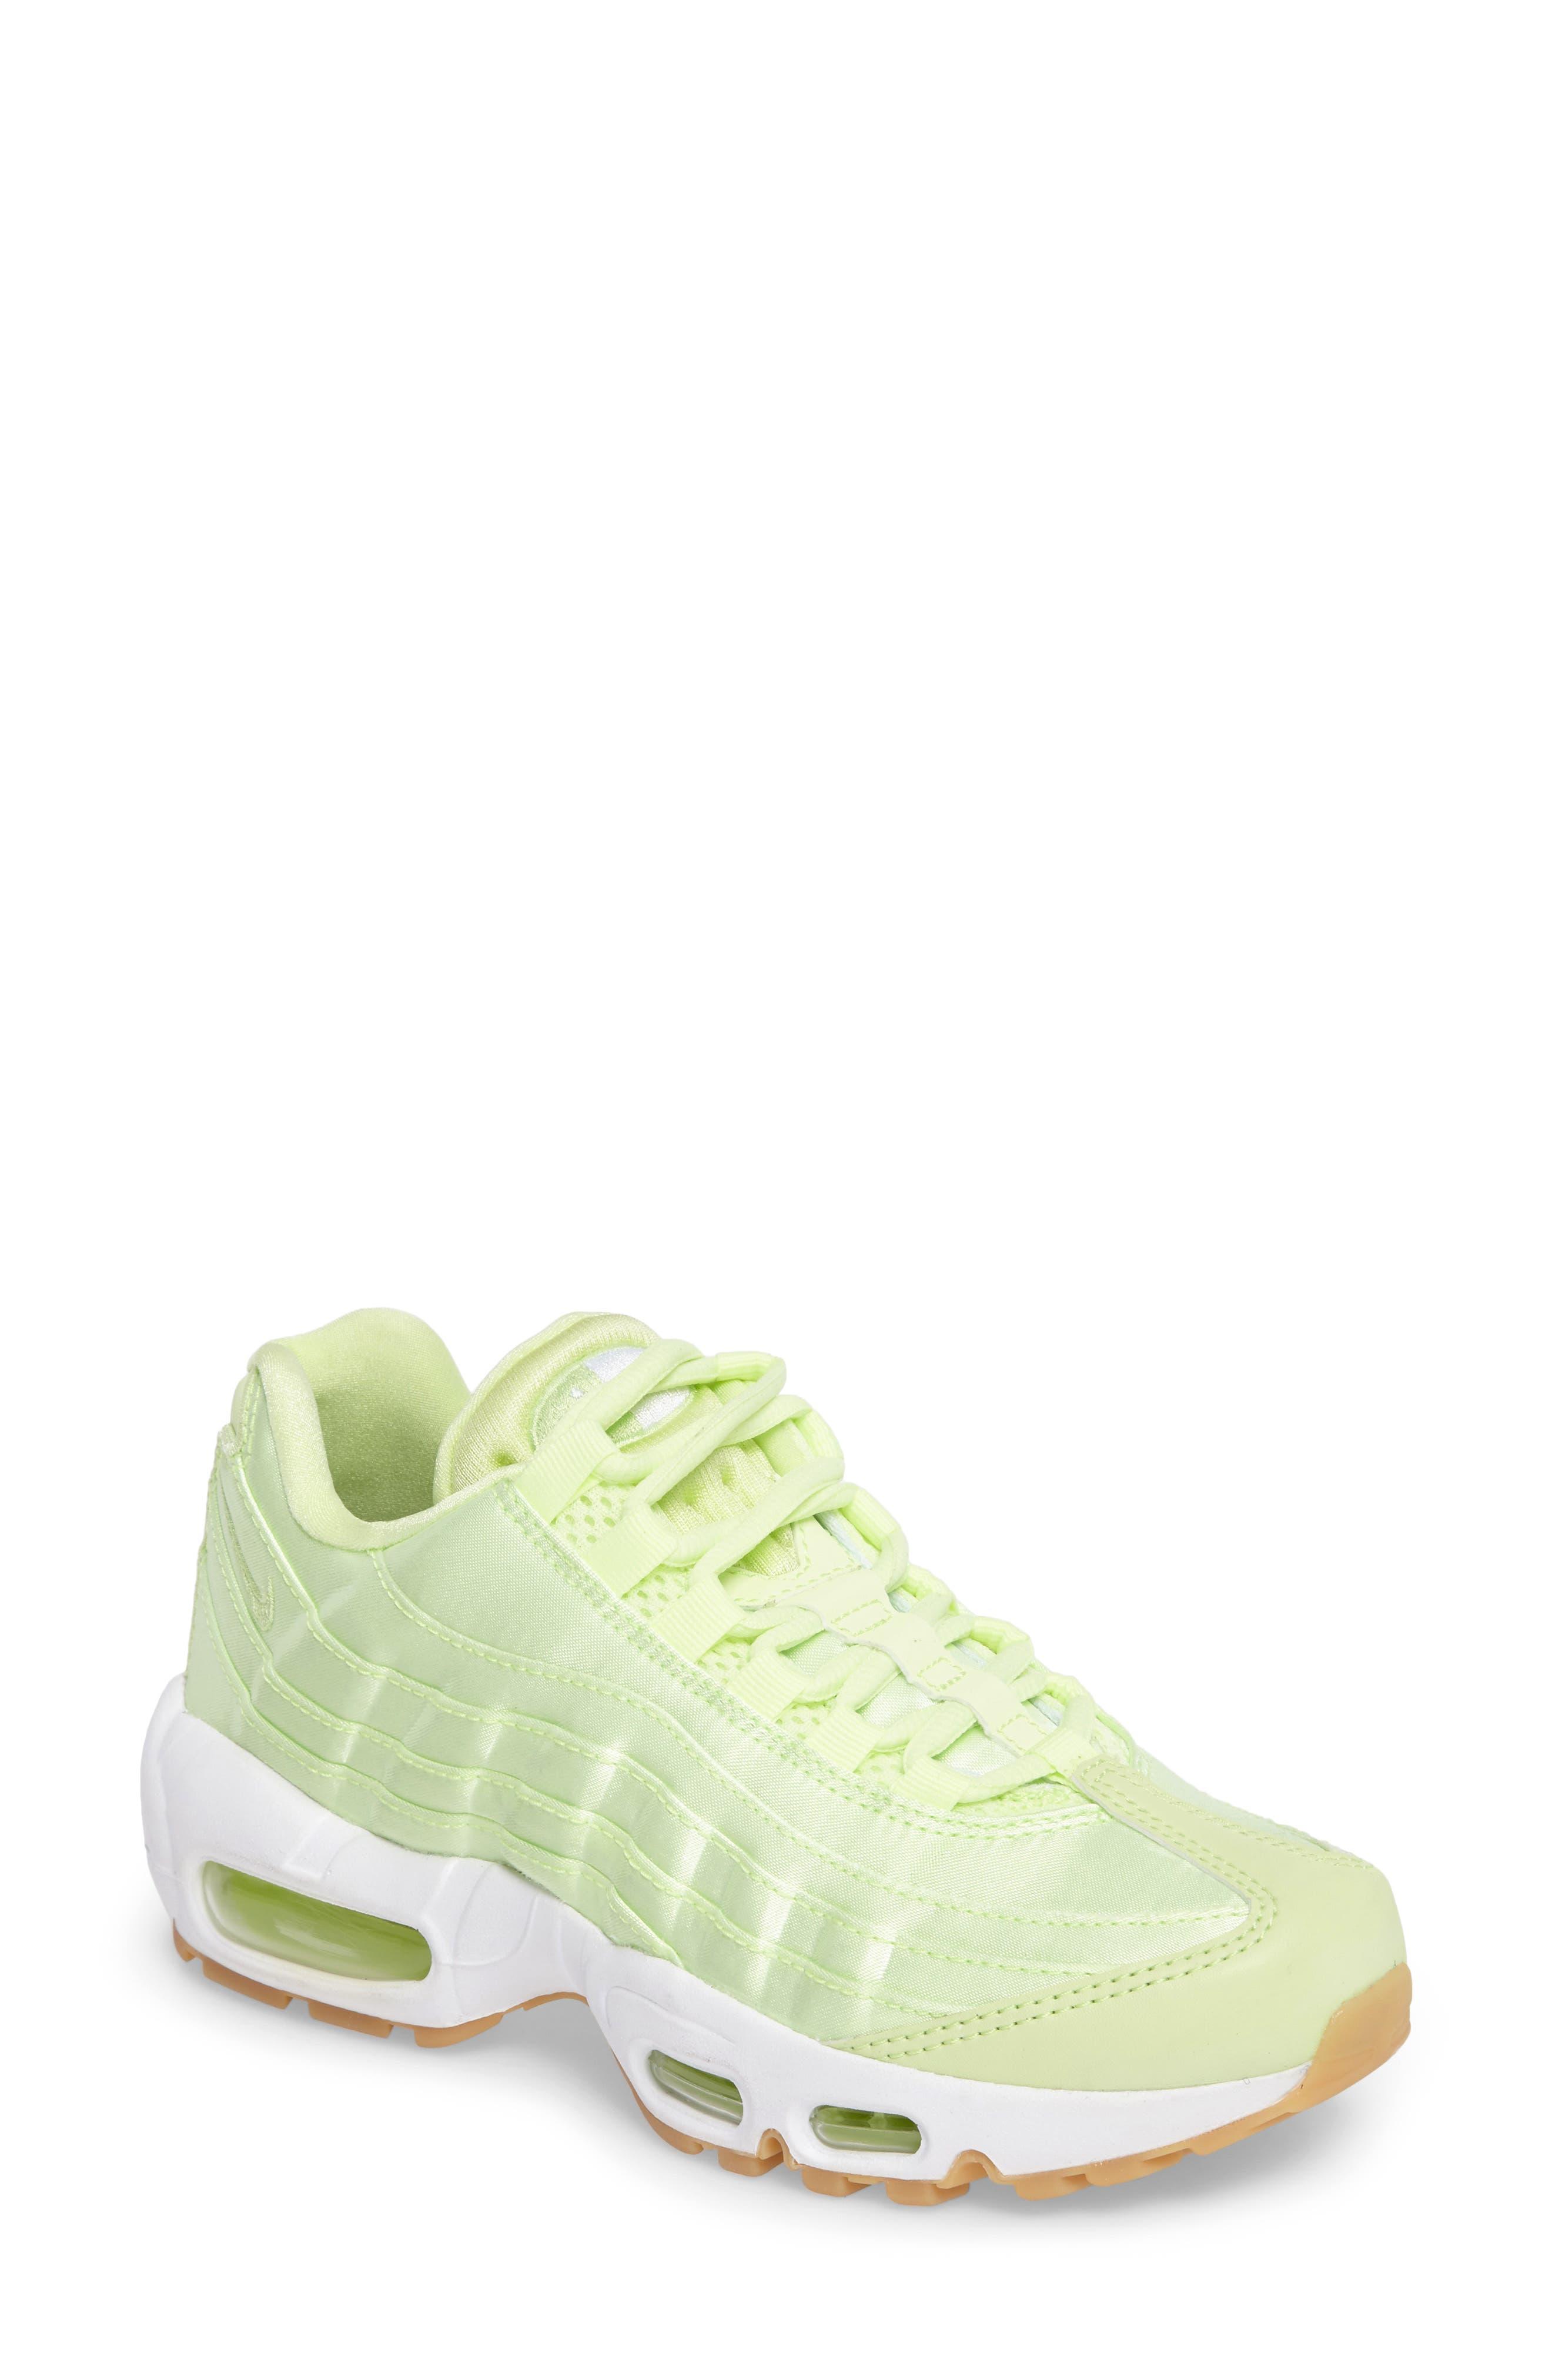 Main Image - Nike Air Max 95 QS Running Shoe (Women)